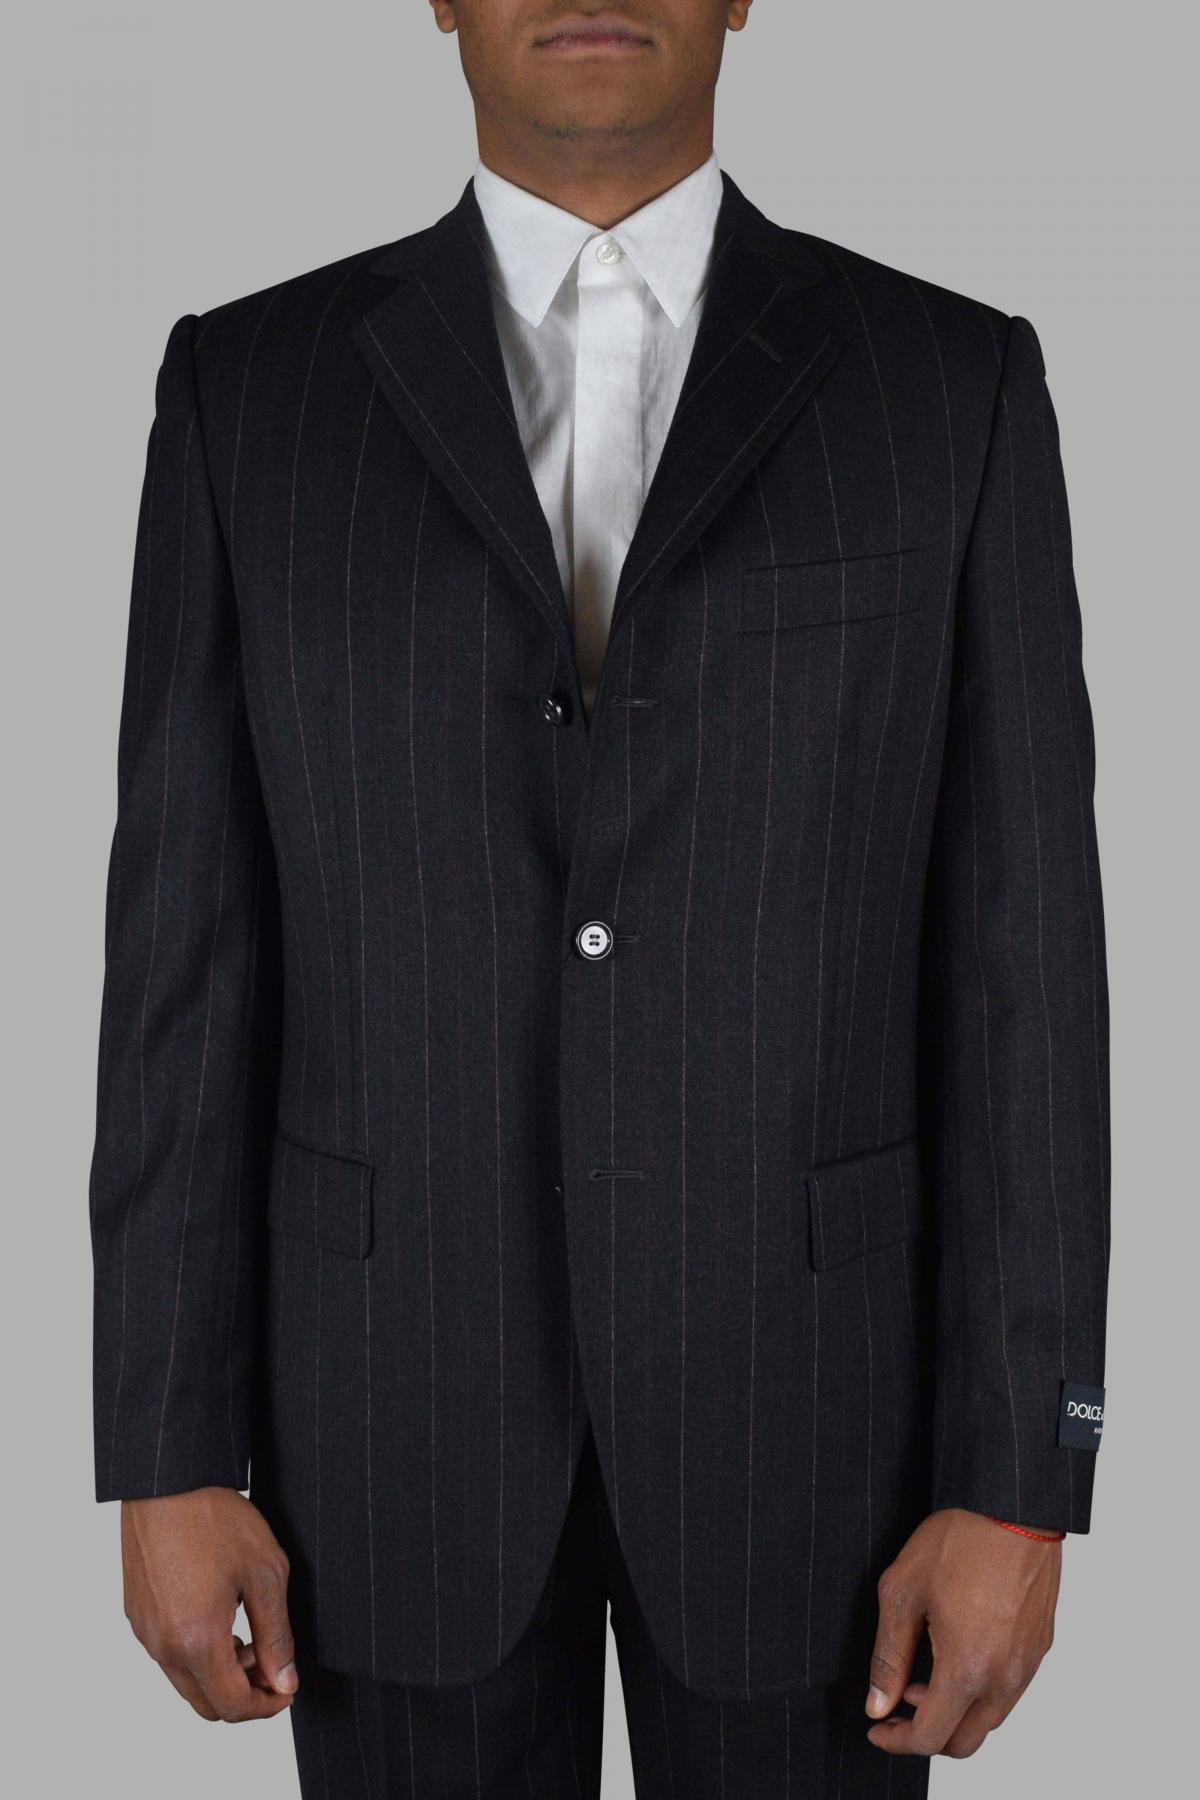 Dolce & Gabbana dark gray two-piece suit with burgundy stripe patterns.